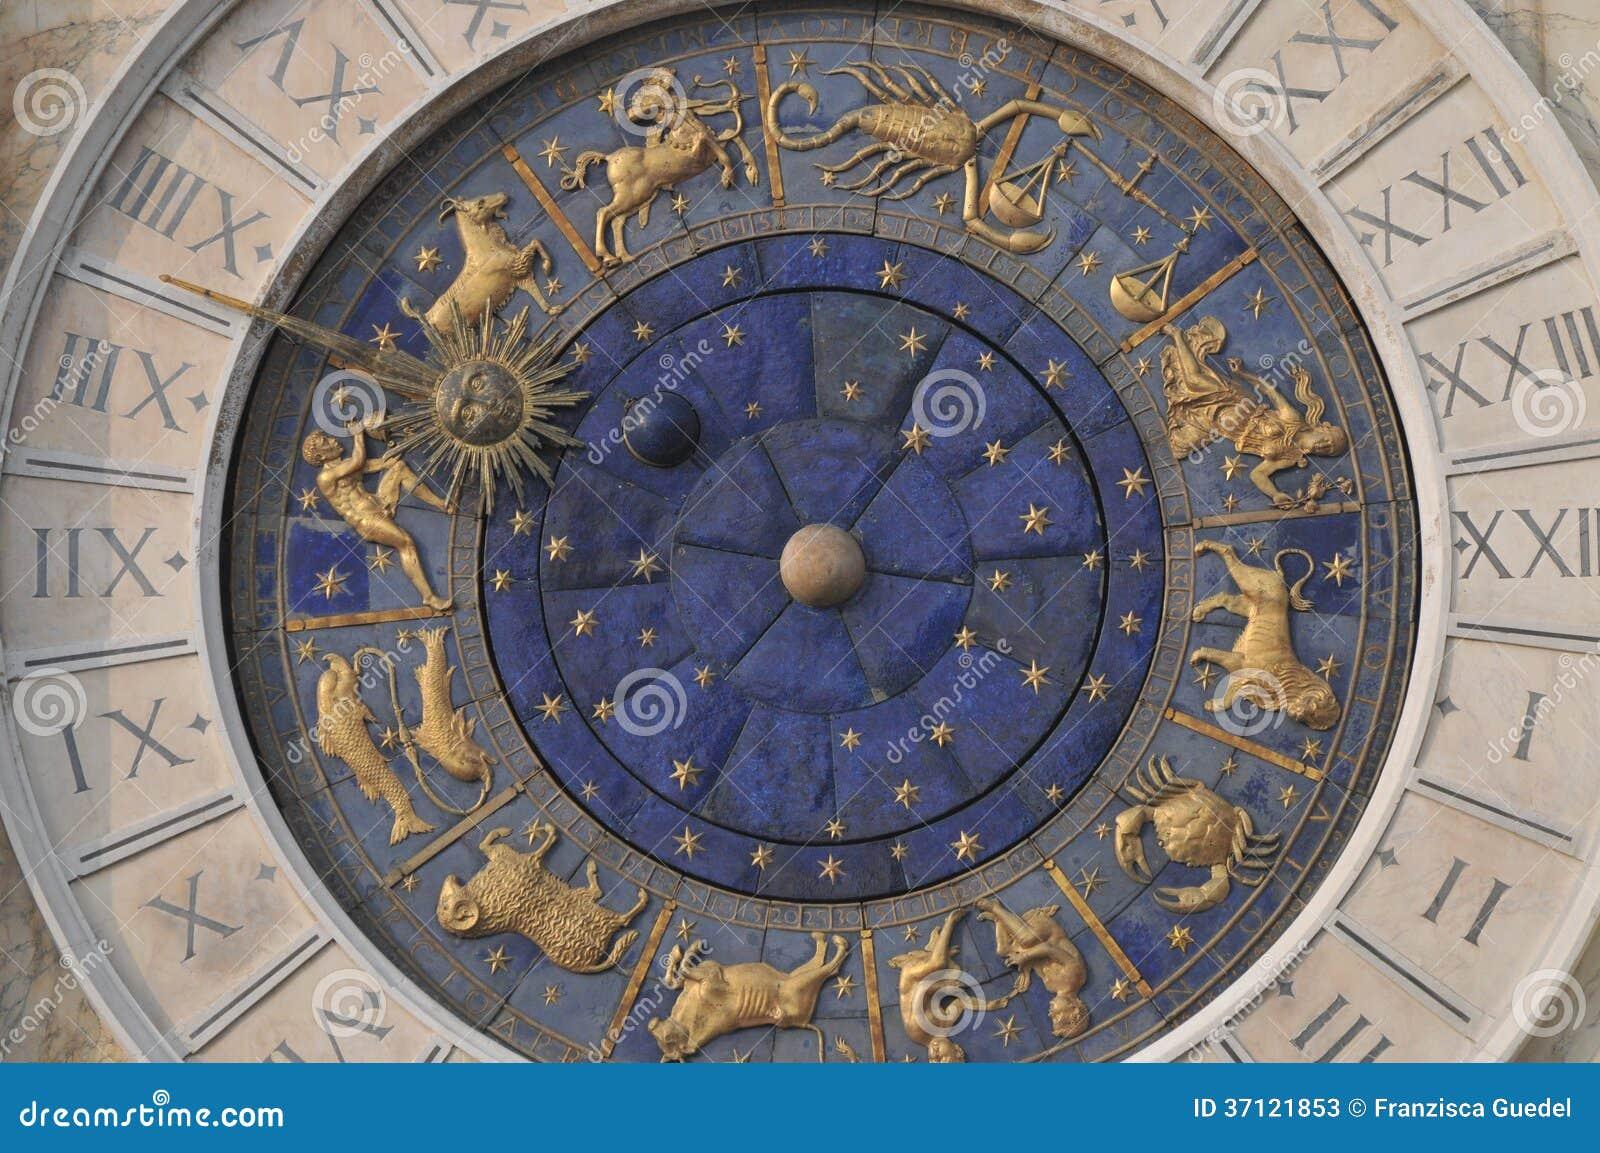 zodiac-clock-venice-beautiful-piazza-san-marco-st-marks-square-italy-37121853.jpg